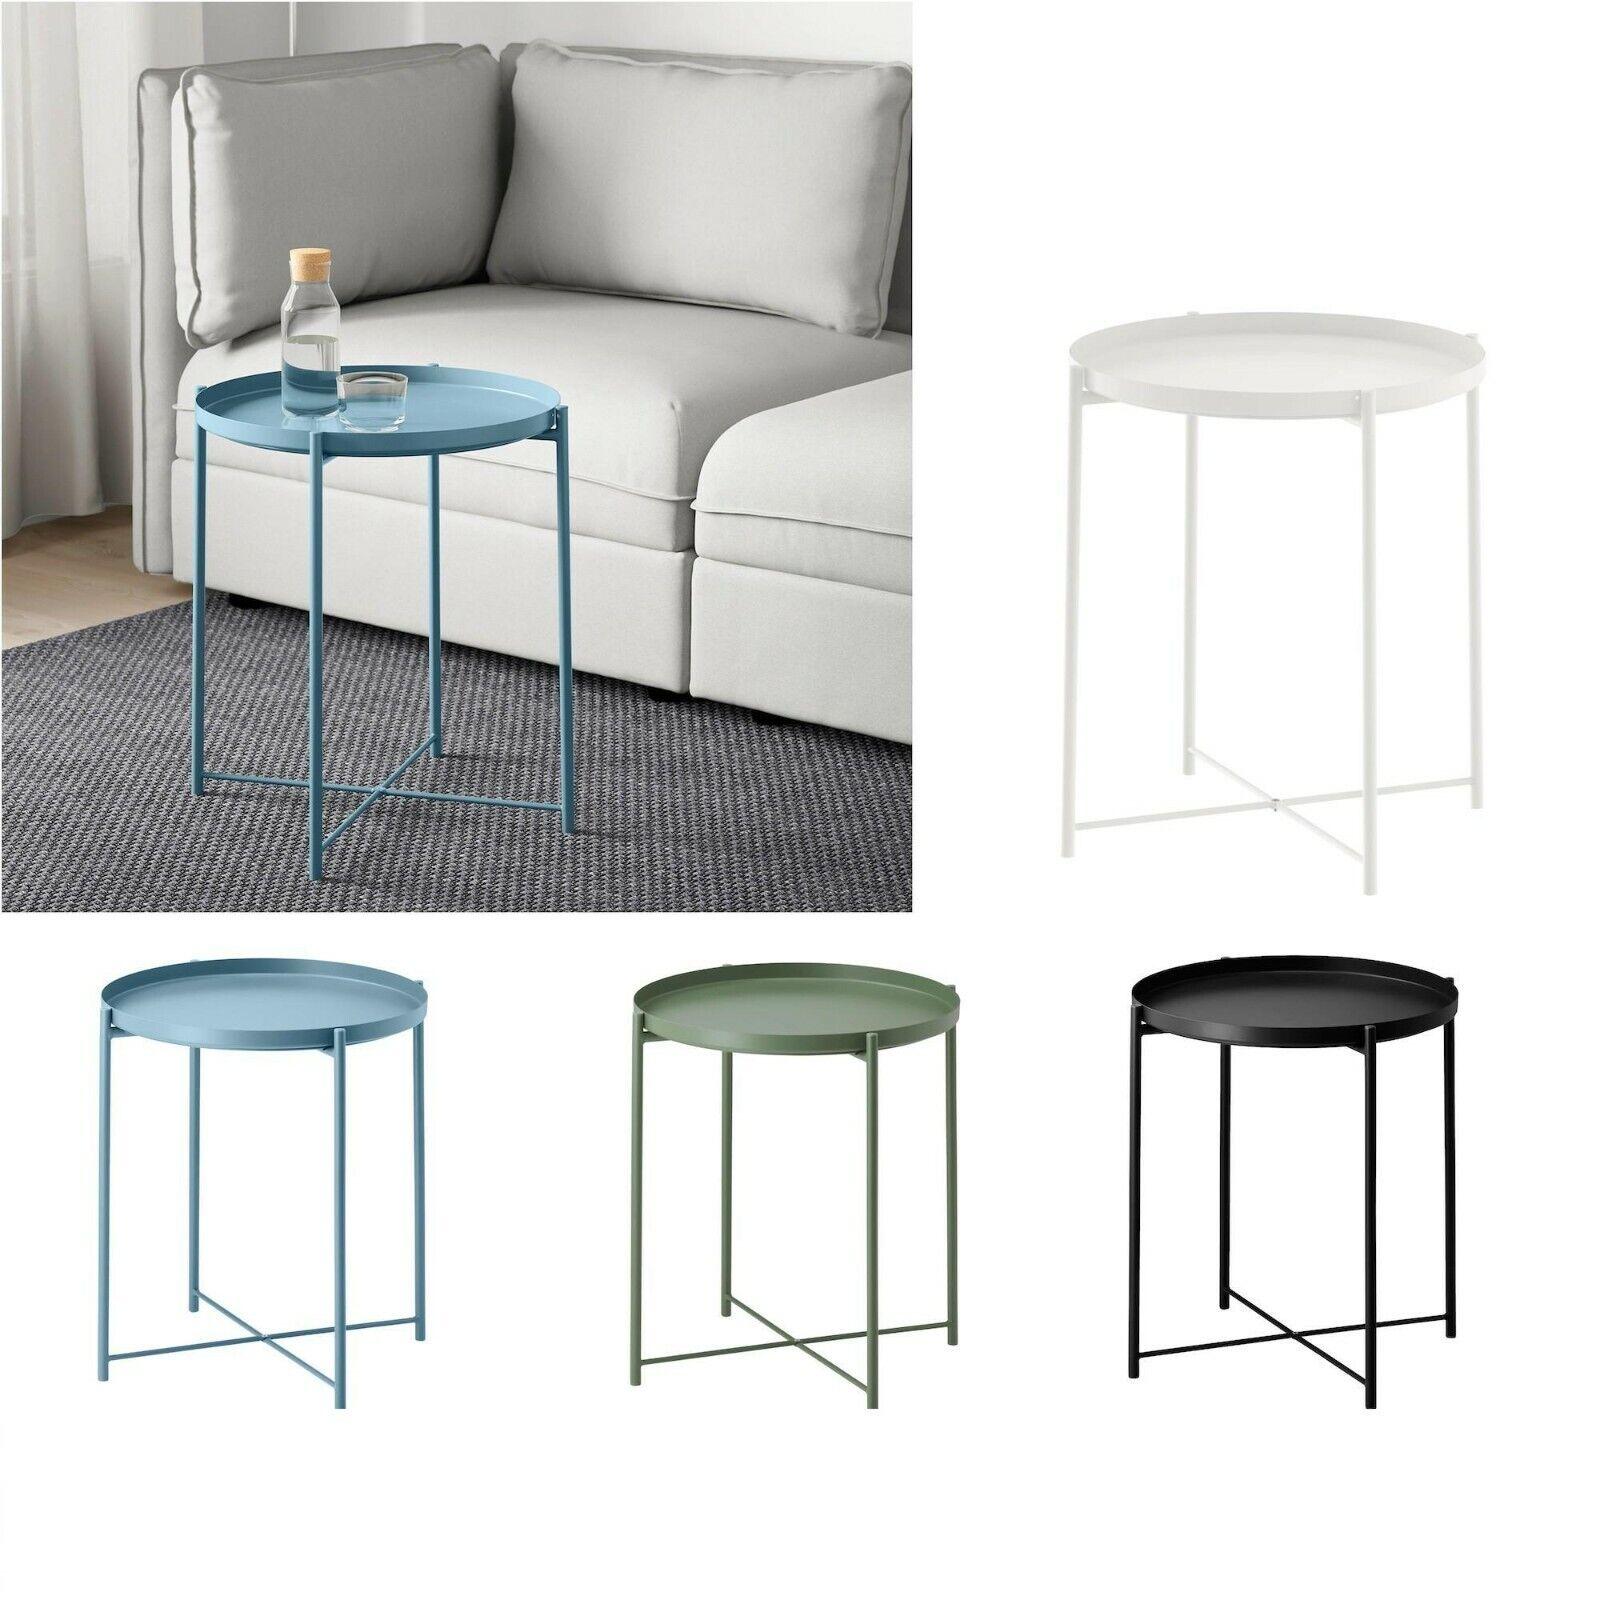 Ikea Vejmon Side Table Black Brown 601 614 67 For Sale Online Ebay